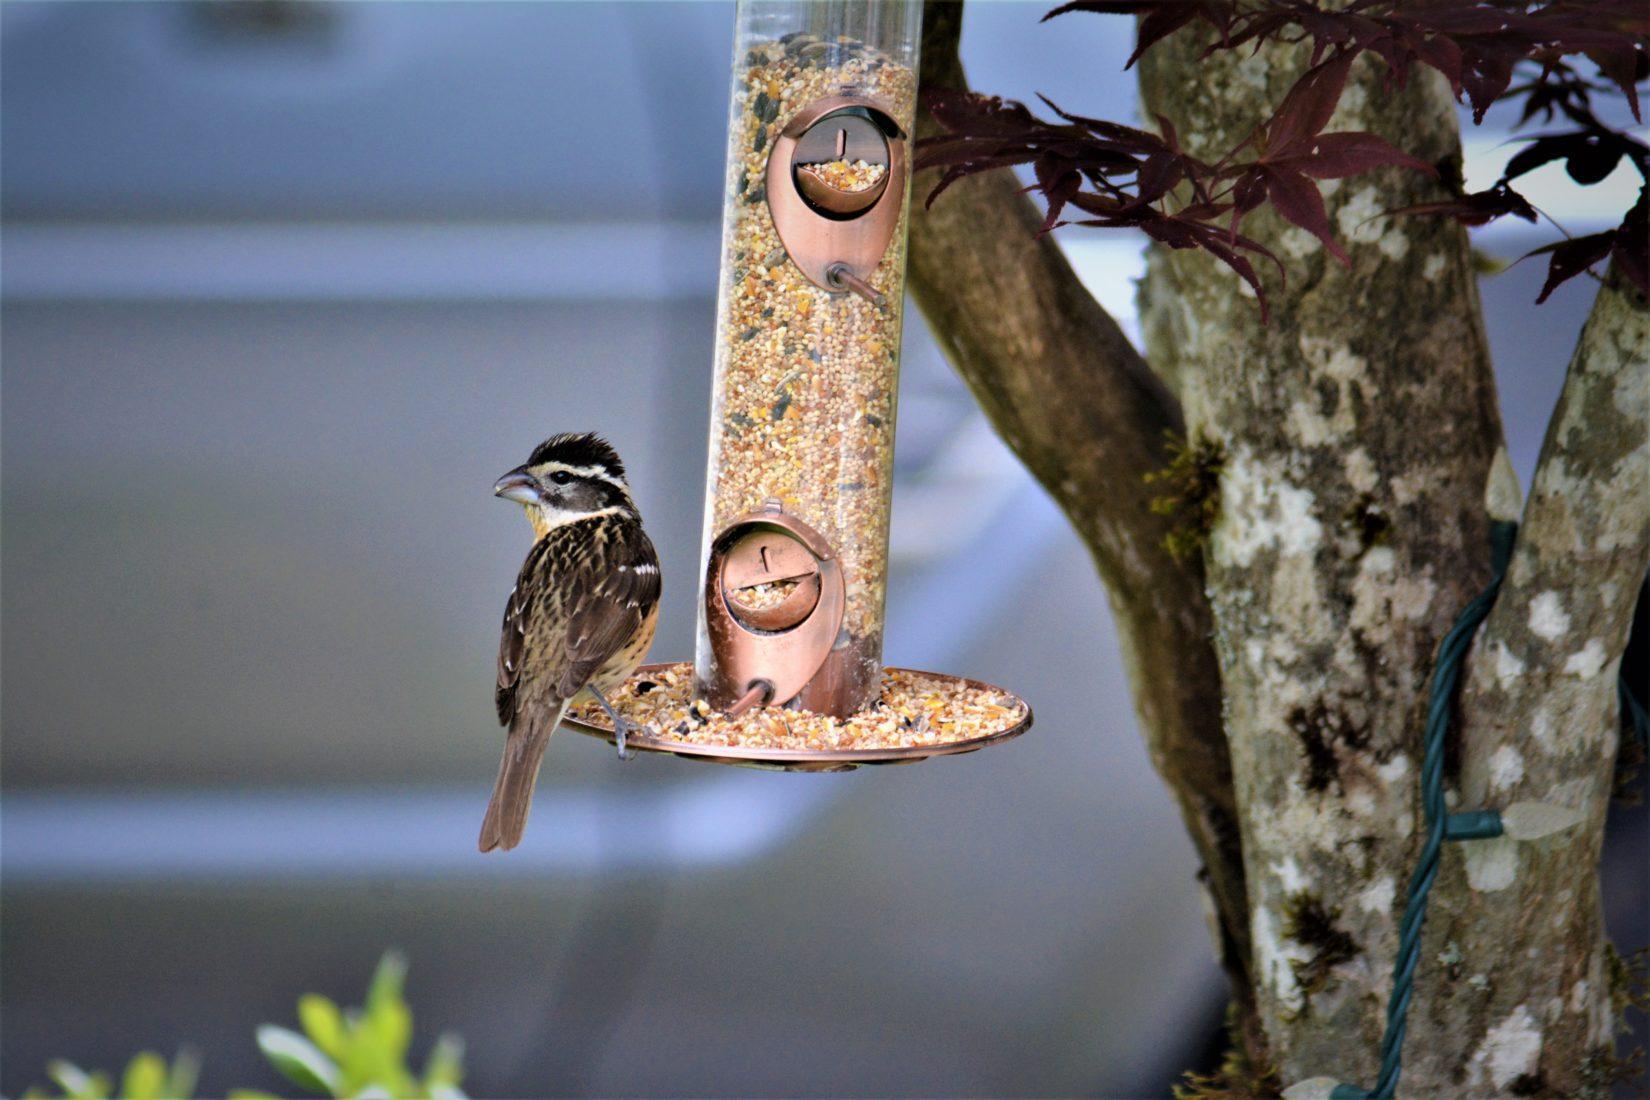 Grosbeak bird sits at bottom of bird feeder